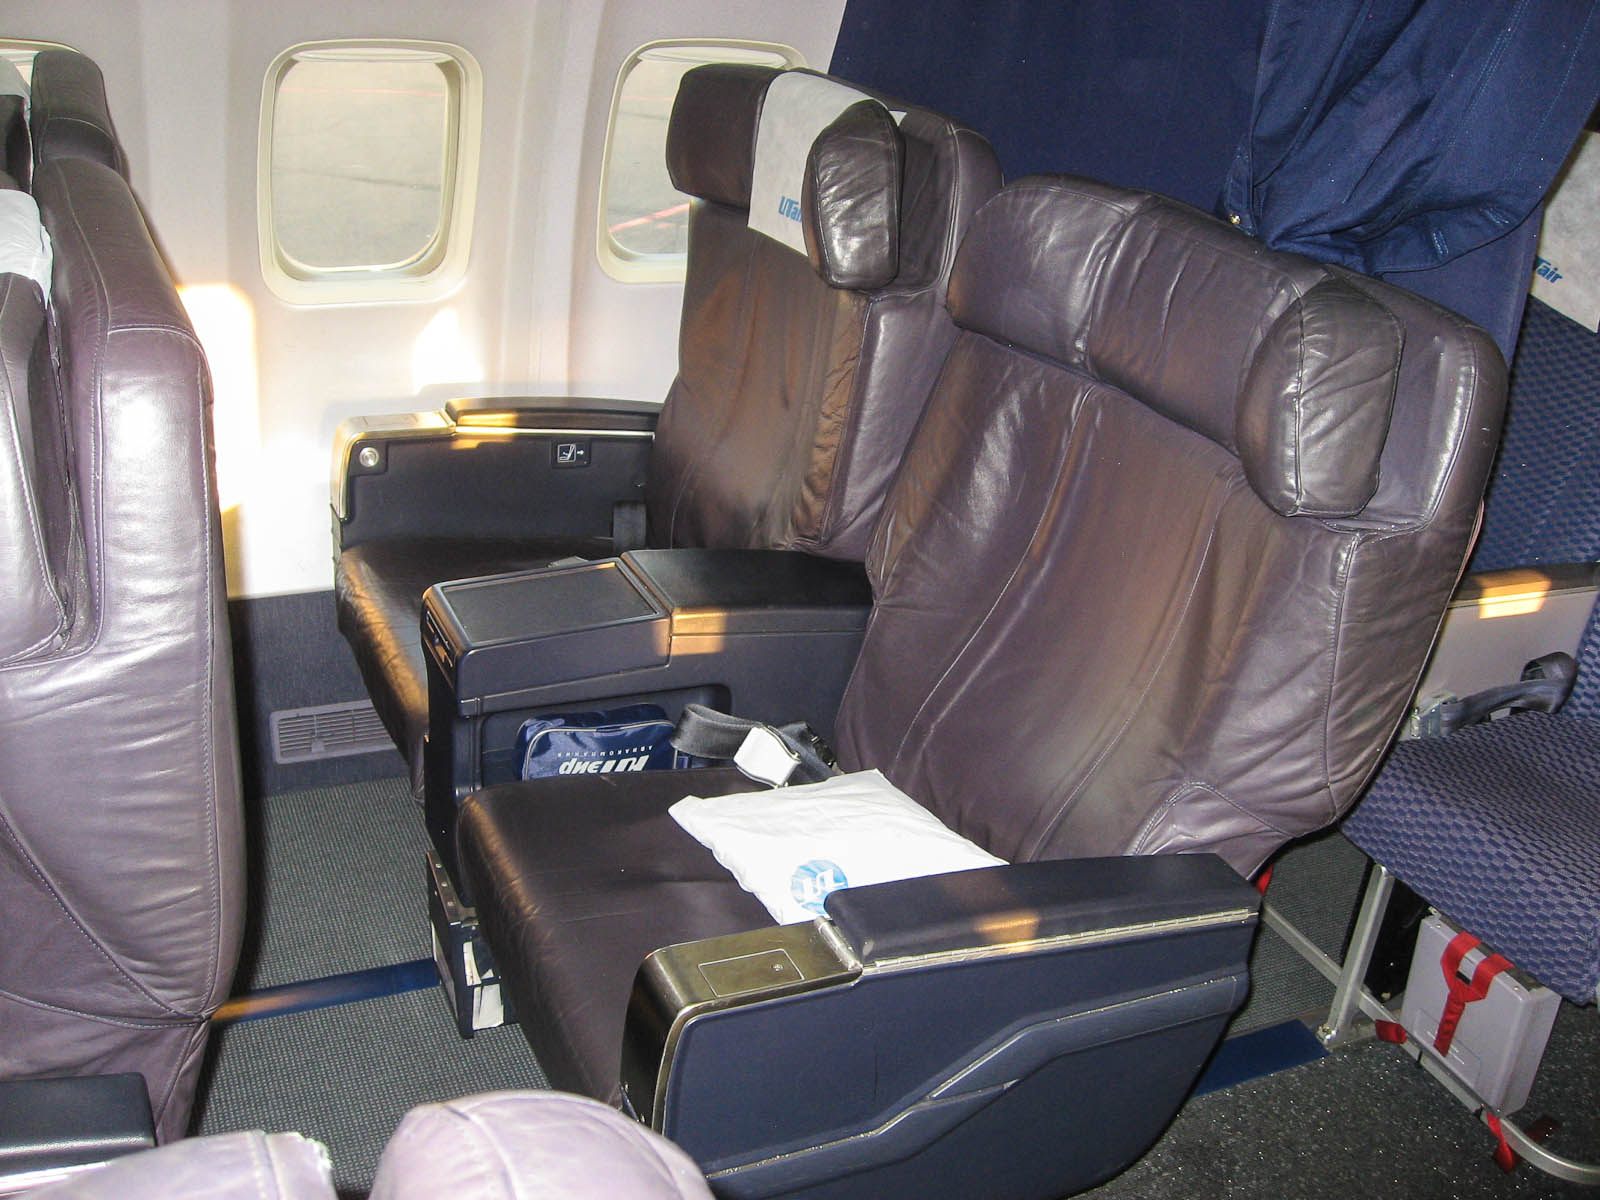 Бизнес-класс в самолете Боинг-737-500 авиакомпании ЮТэйр